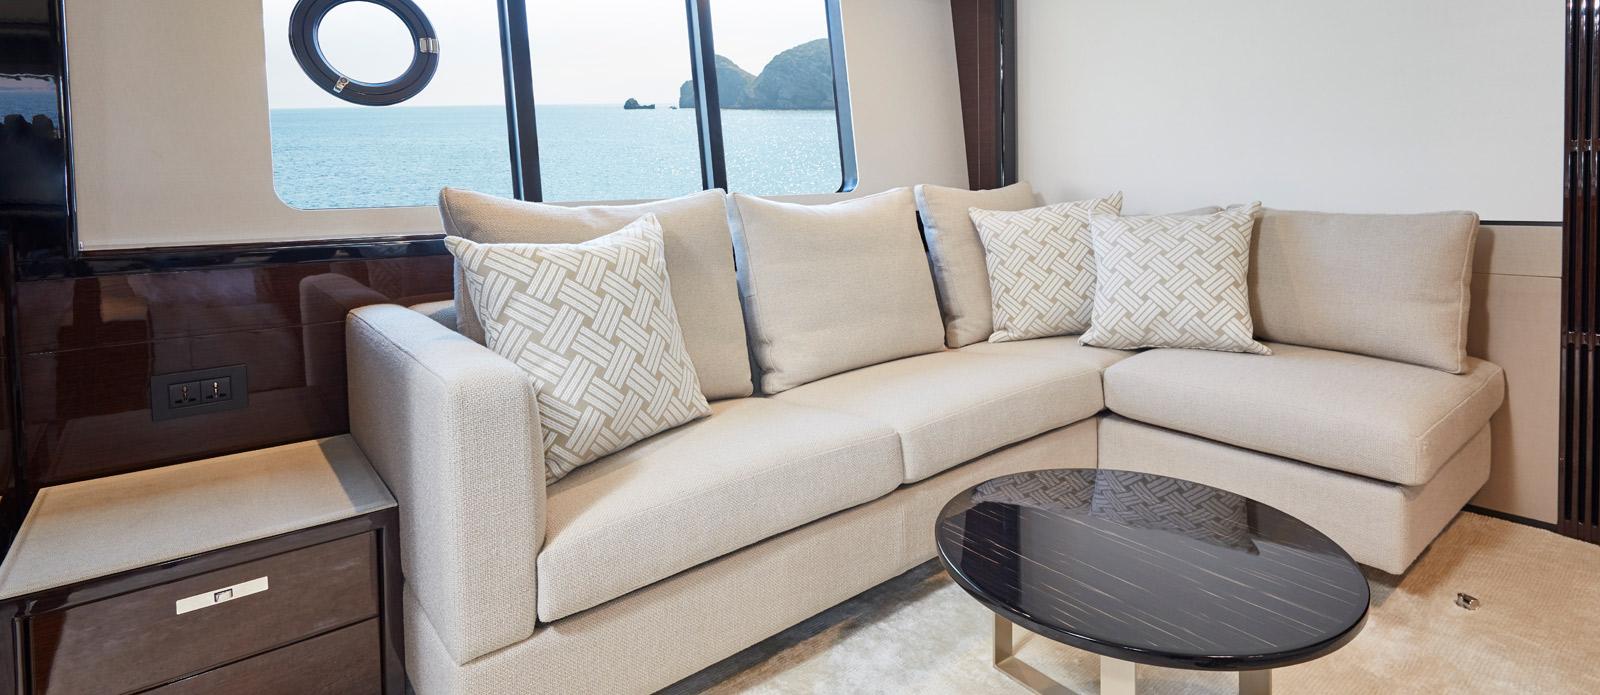 Princess 30 Metre Yacht Bandazul - VIP Cabin Sofa